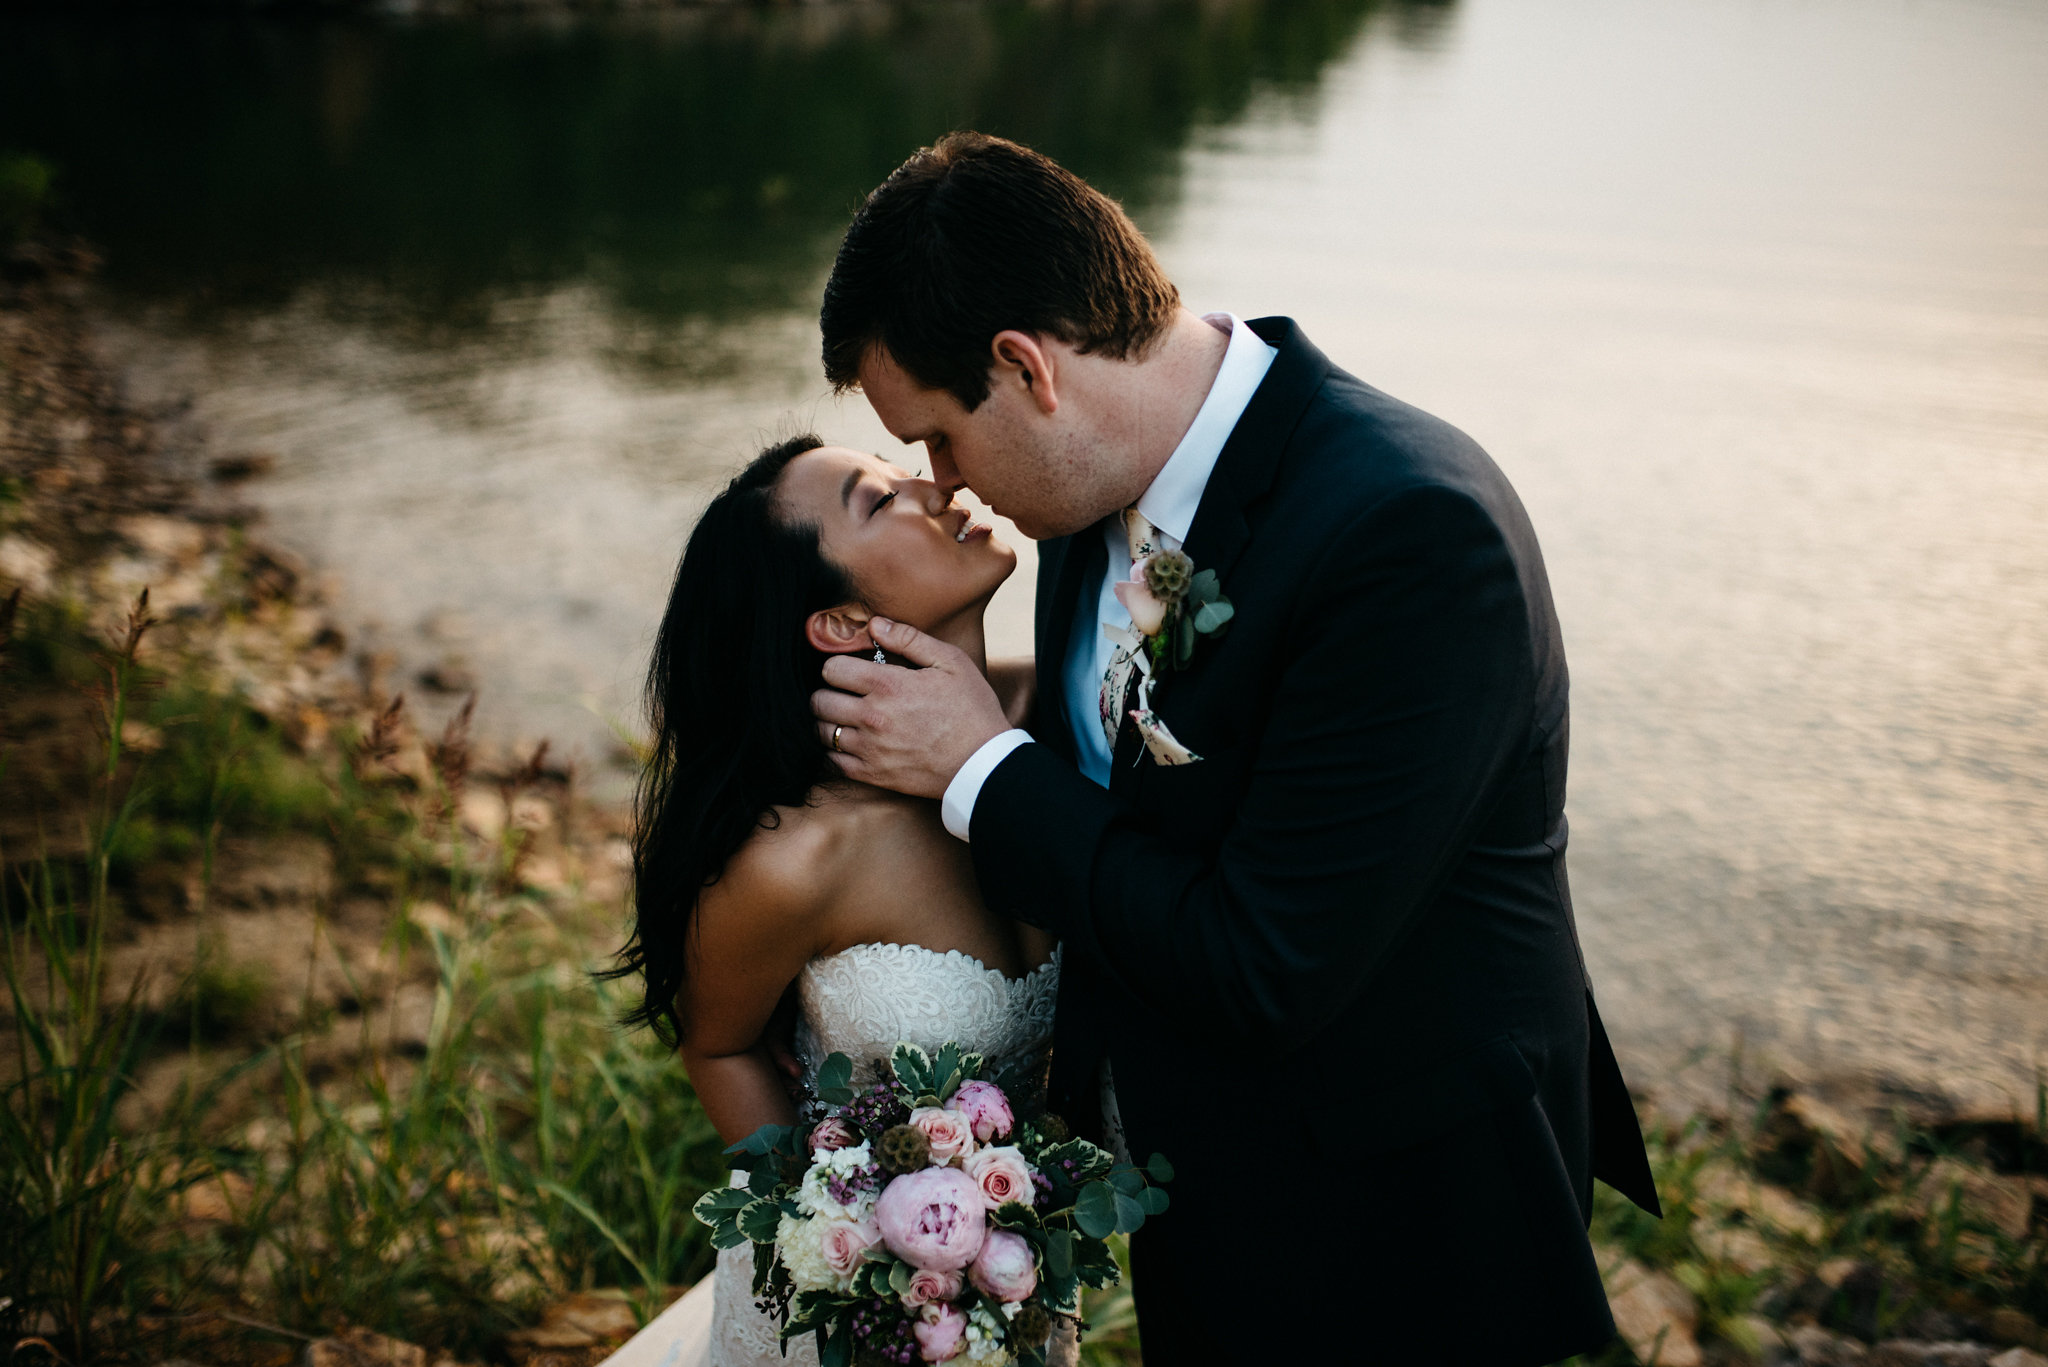 Lexi Hoebing Photography | Tulsa Oklahoma Wedding Photographer